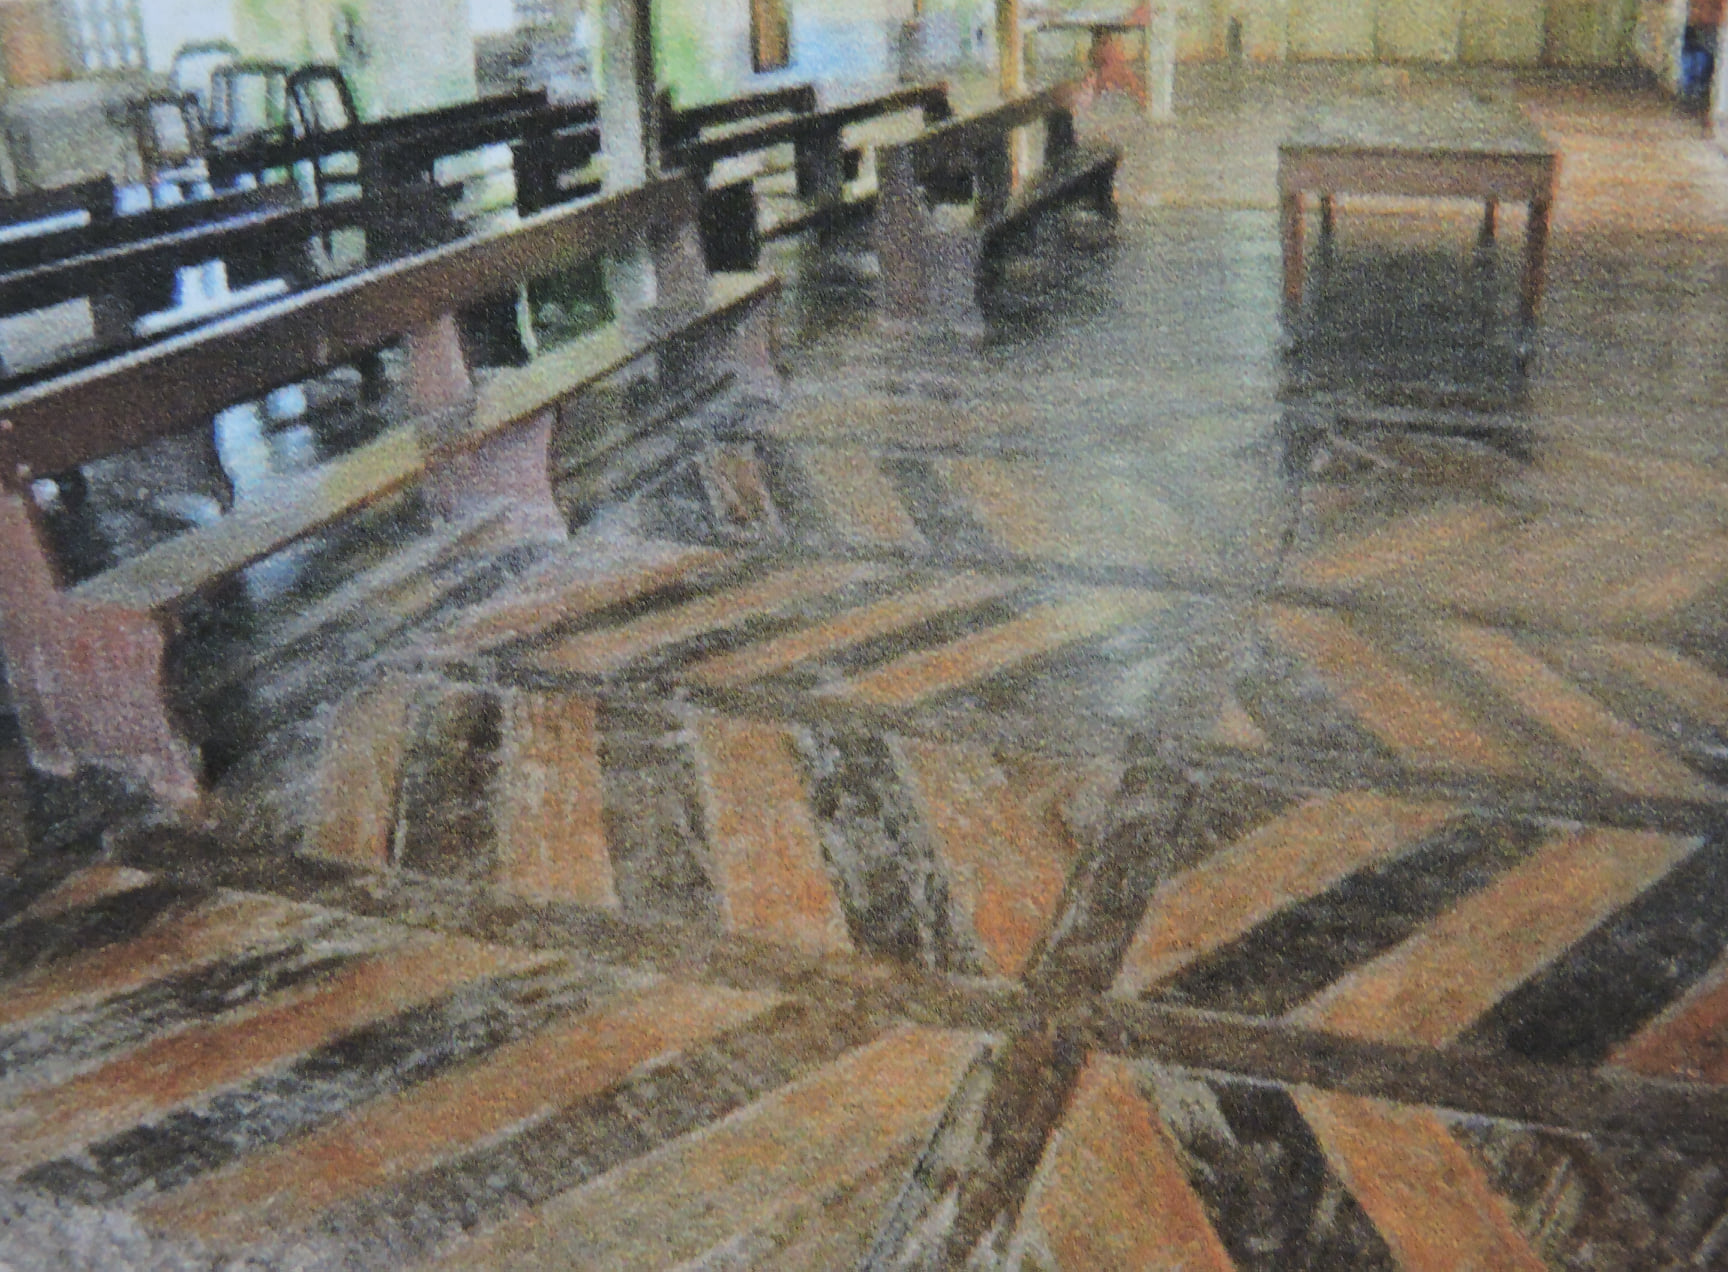 Lazi Church has molave floorwork arranged in a zigzag-like pattern